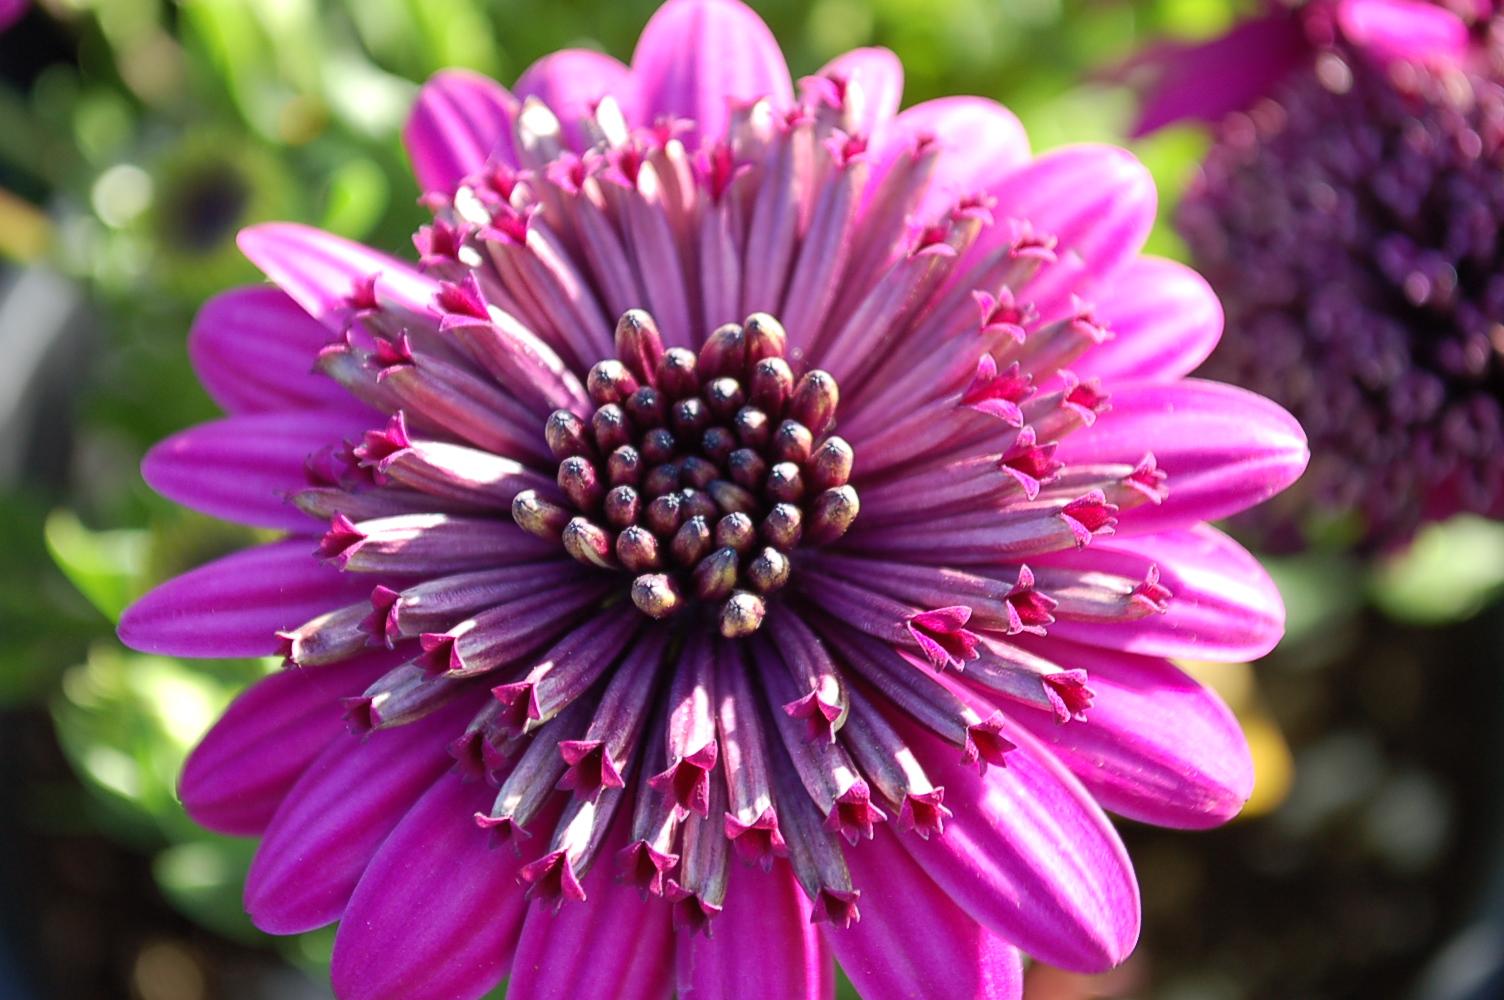 041919 SPRING FLOWERS 005